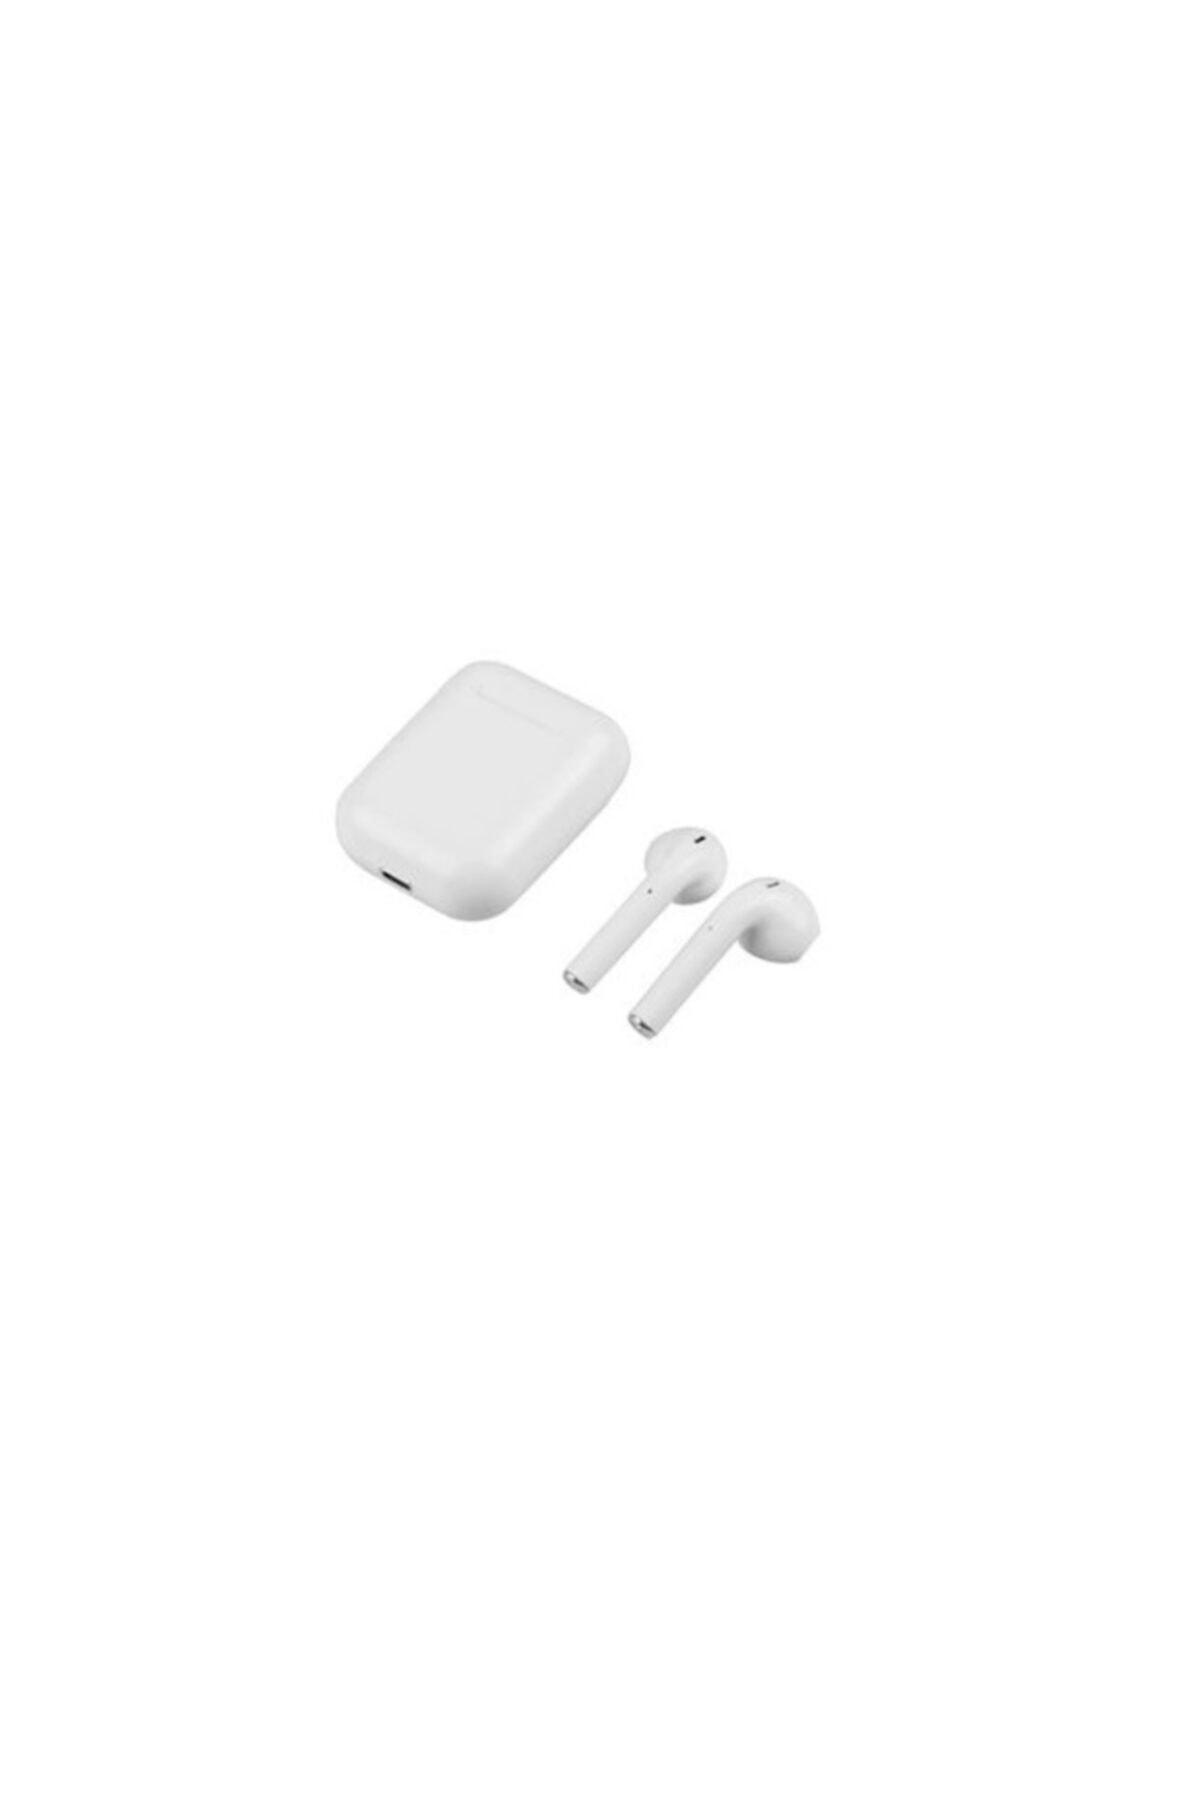 TrkTech Airpods I12 Beyaz Bluetooth Kulaklık Tüm Telefonlar Ile Uyumlu 1. Kalite 2